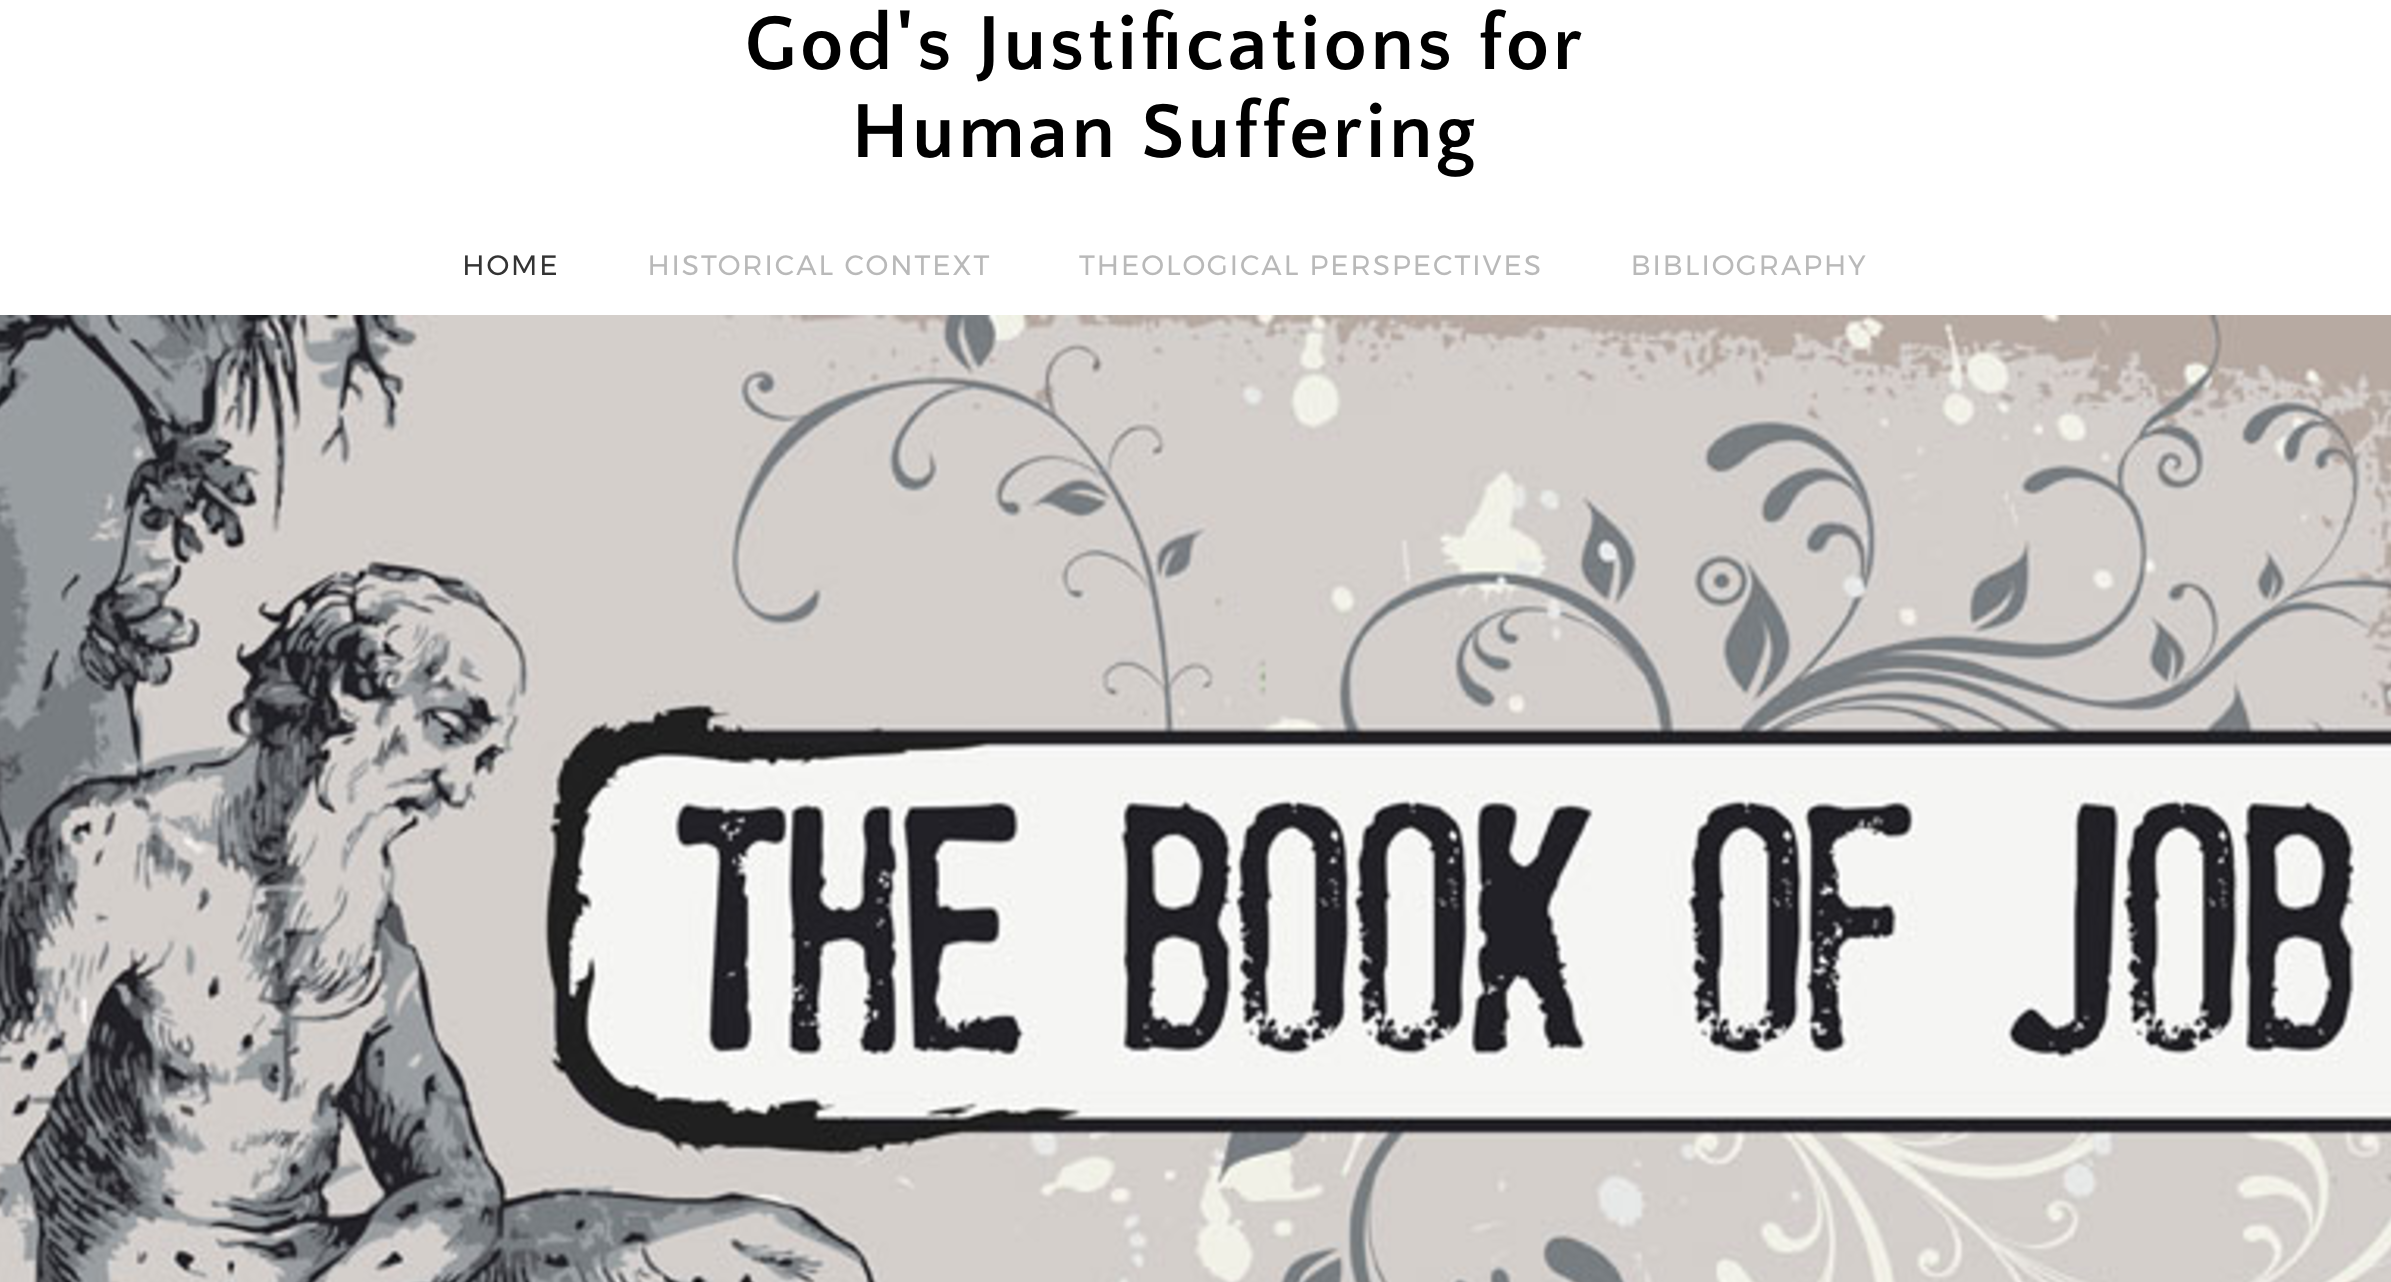 Sample webpage from Biblical Theology Spring 2017 semester.